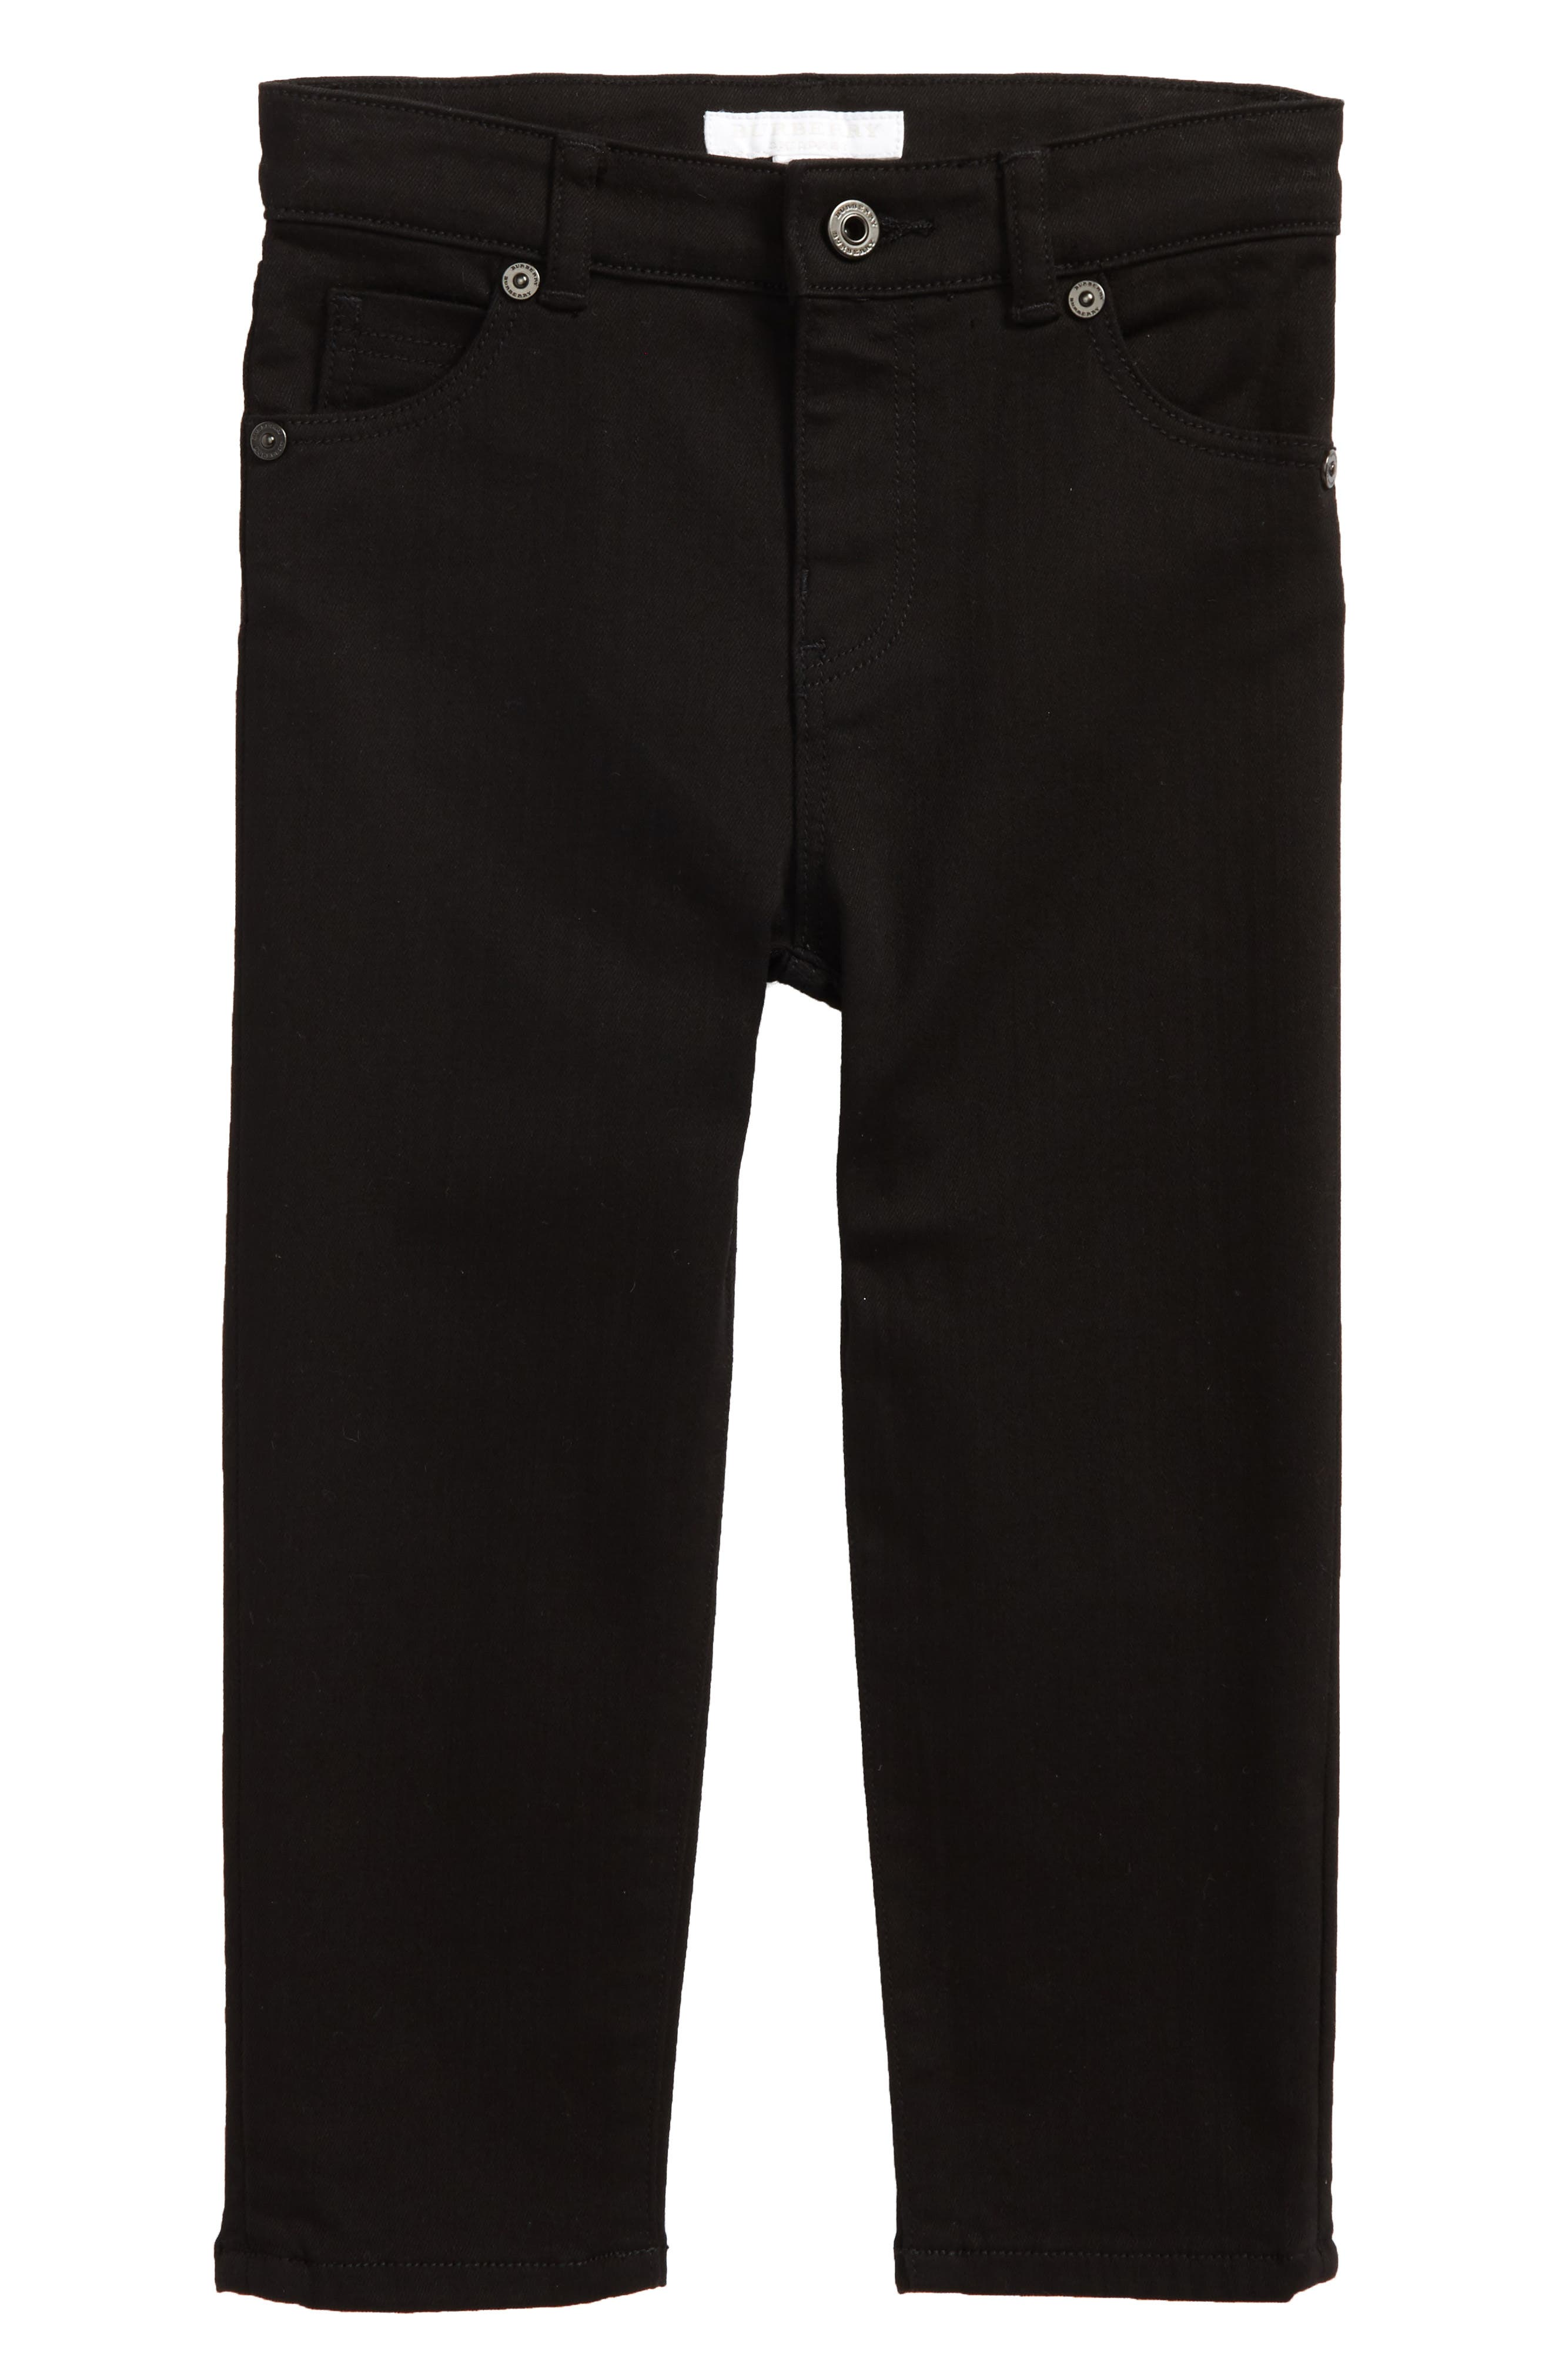 Alternate Image 1 Selected - Burberry Skinny Jeans (Toddler Boys, Little Boys & Big Boys)